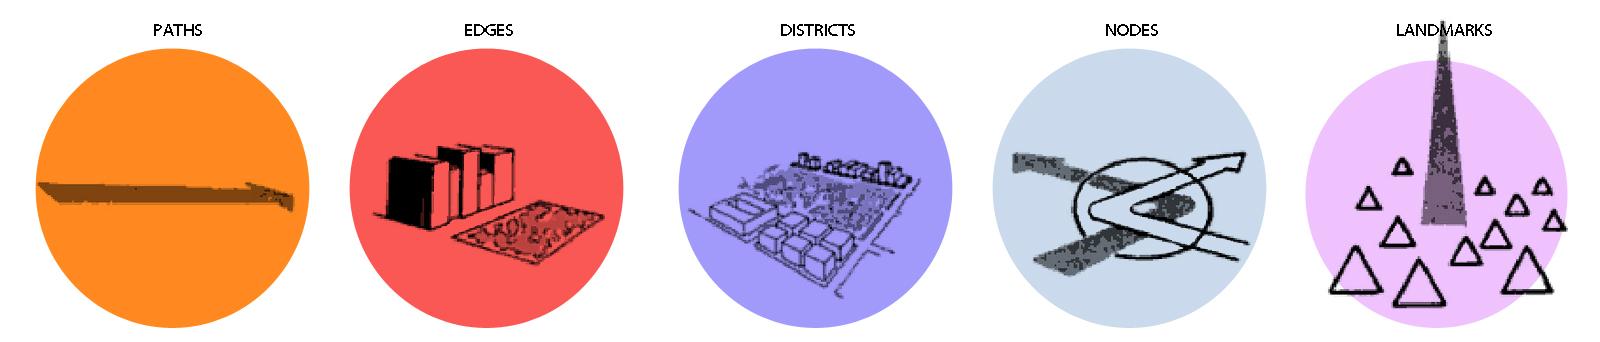 Urban Design Seminar Arch585 Module 3 Influential Urban